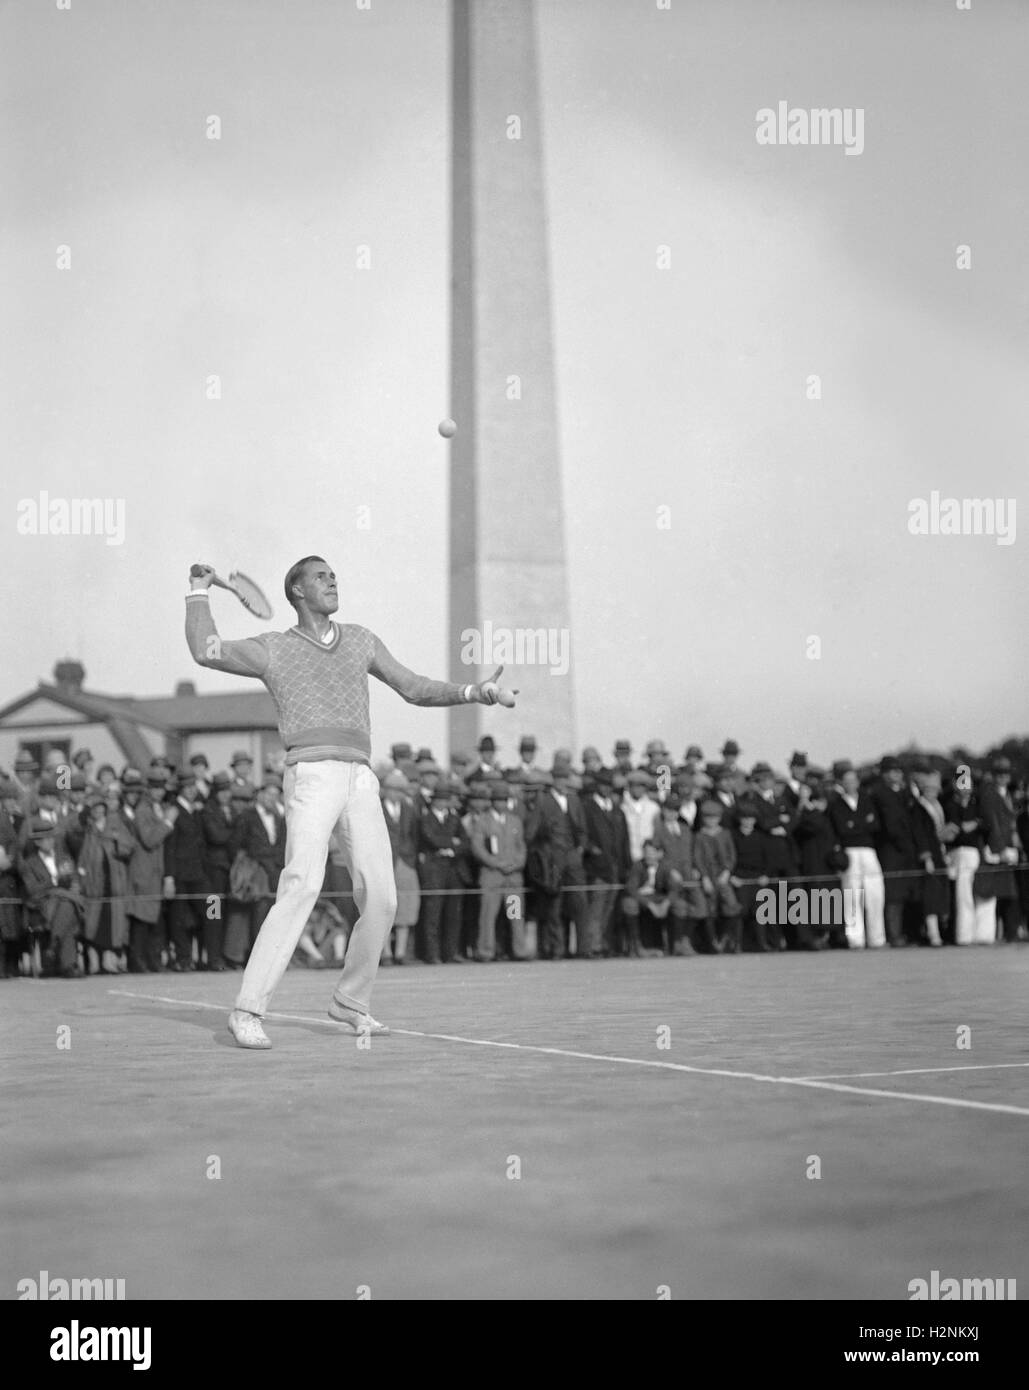 Tennis Player Bill Tilden in Action Washington DC USA National